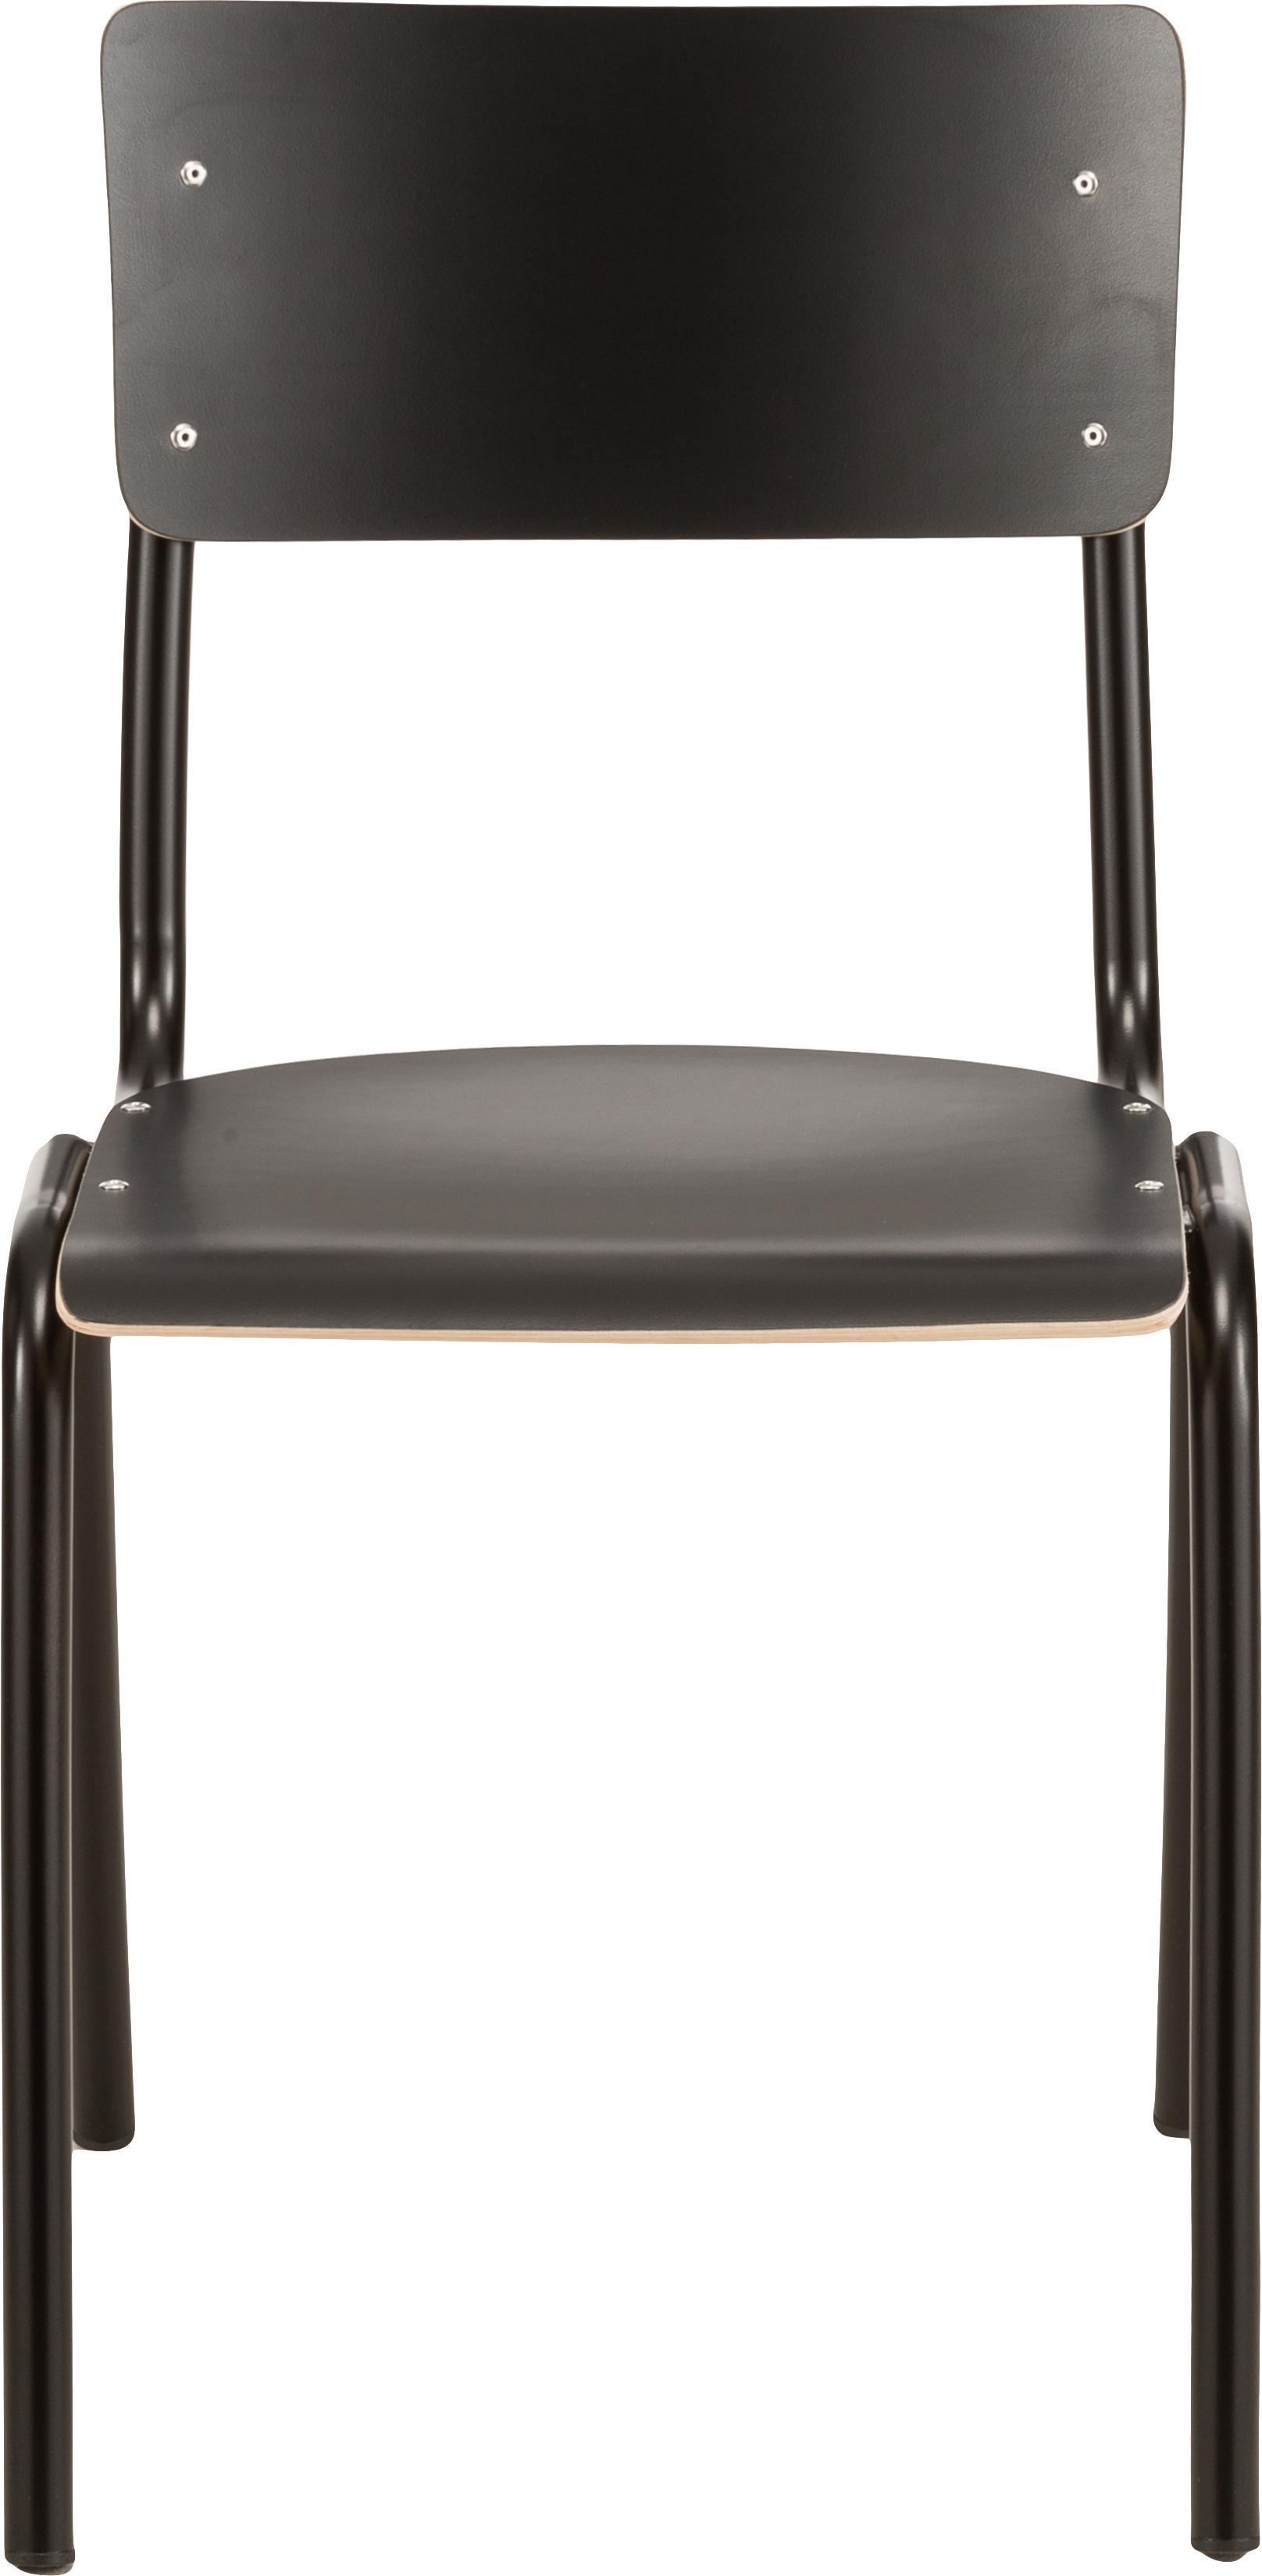 Stühle Back to School, 4 Stück, Sitzfläche: Laminat, Schwarz, B 43 x T 47 cm